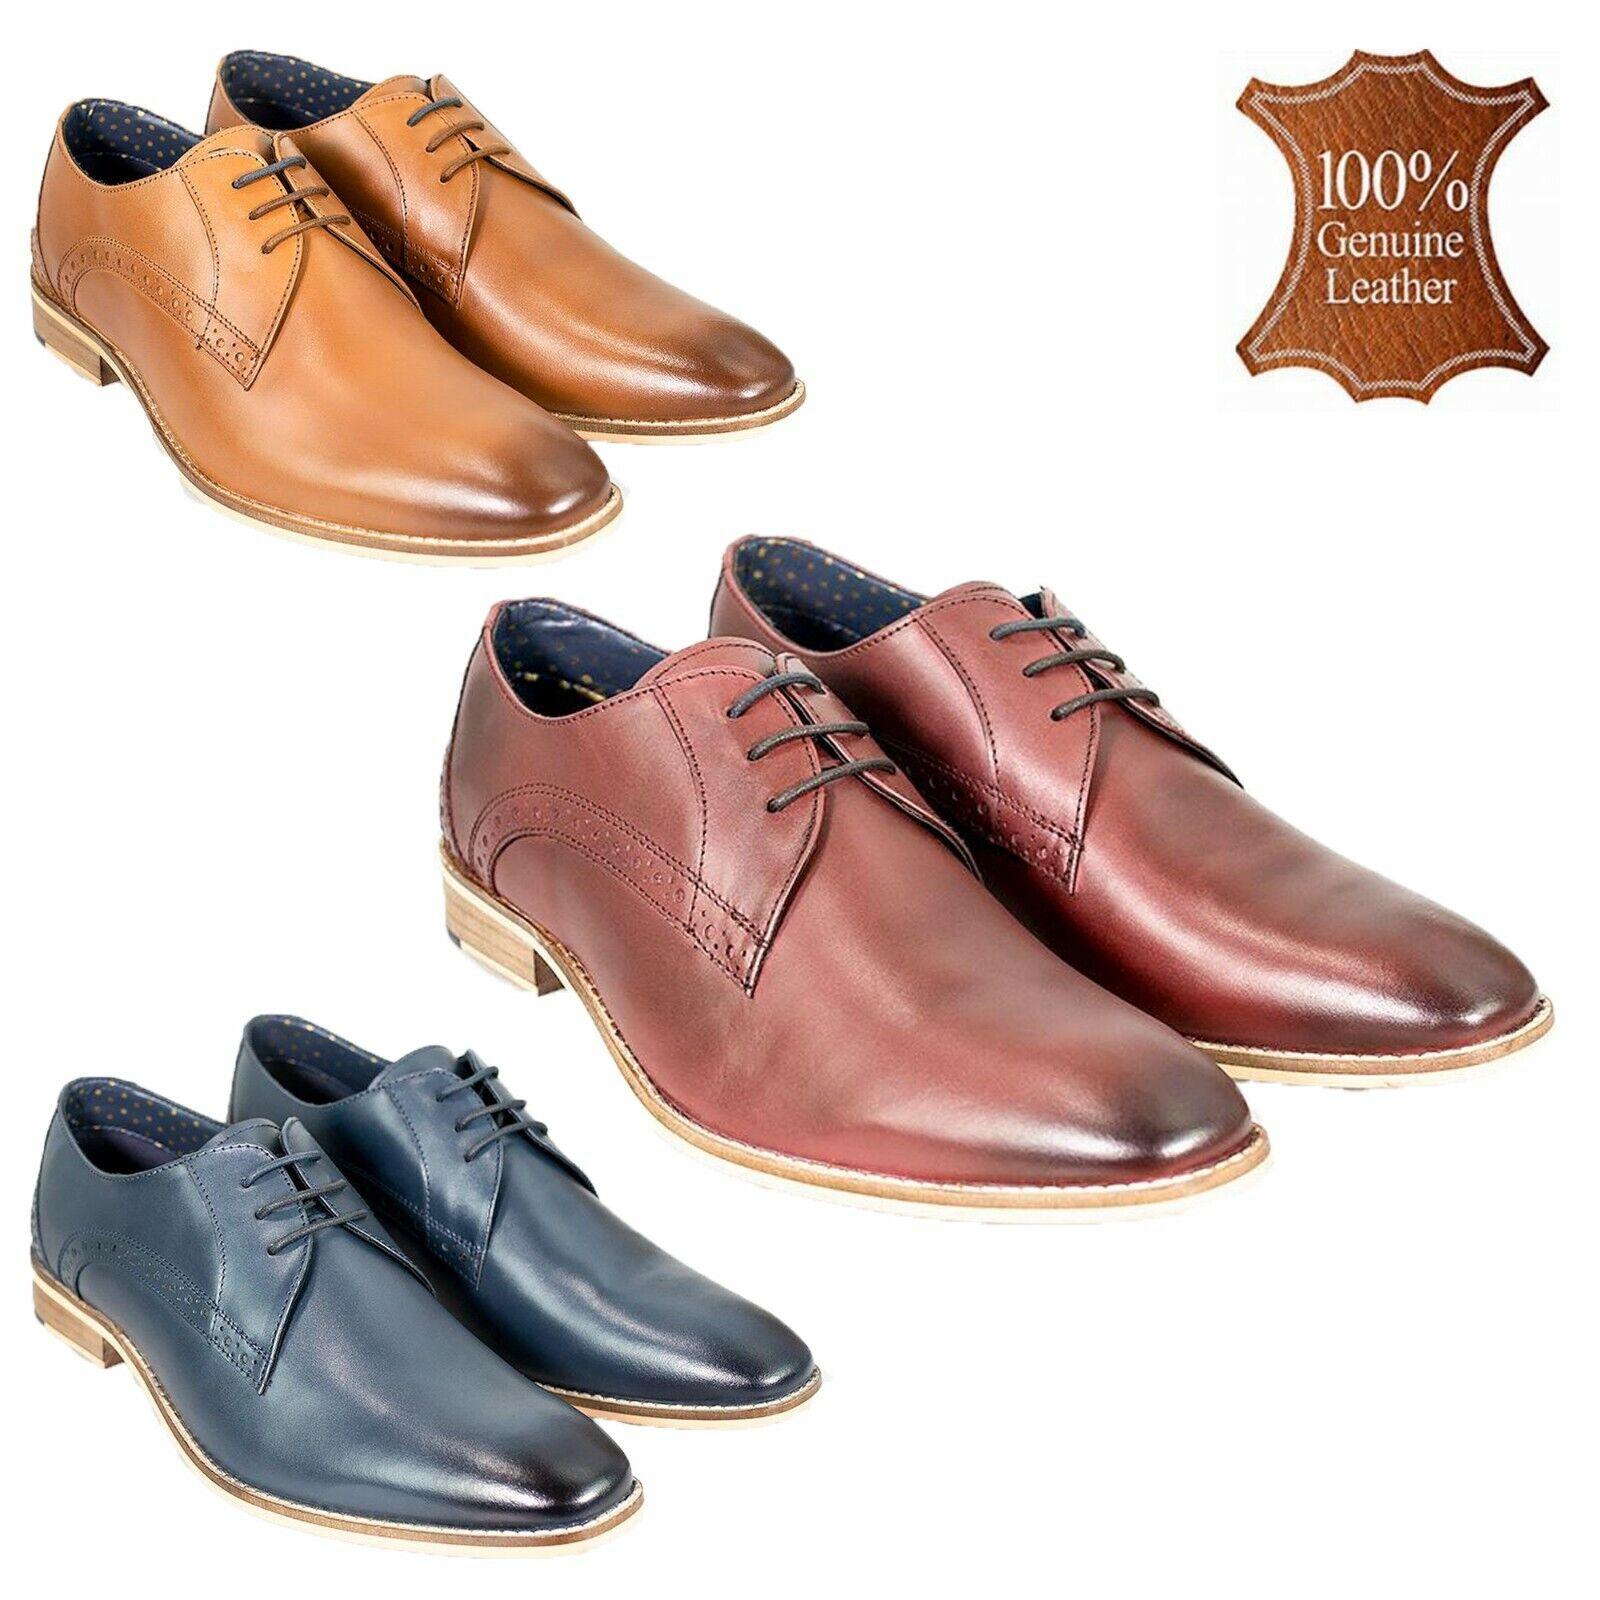 Mens Genuine Leather Italian Brogue schuhe Formal Casual Wedding Footwear